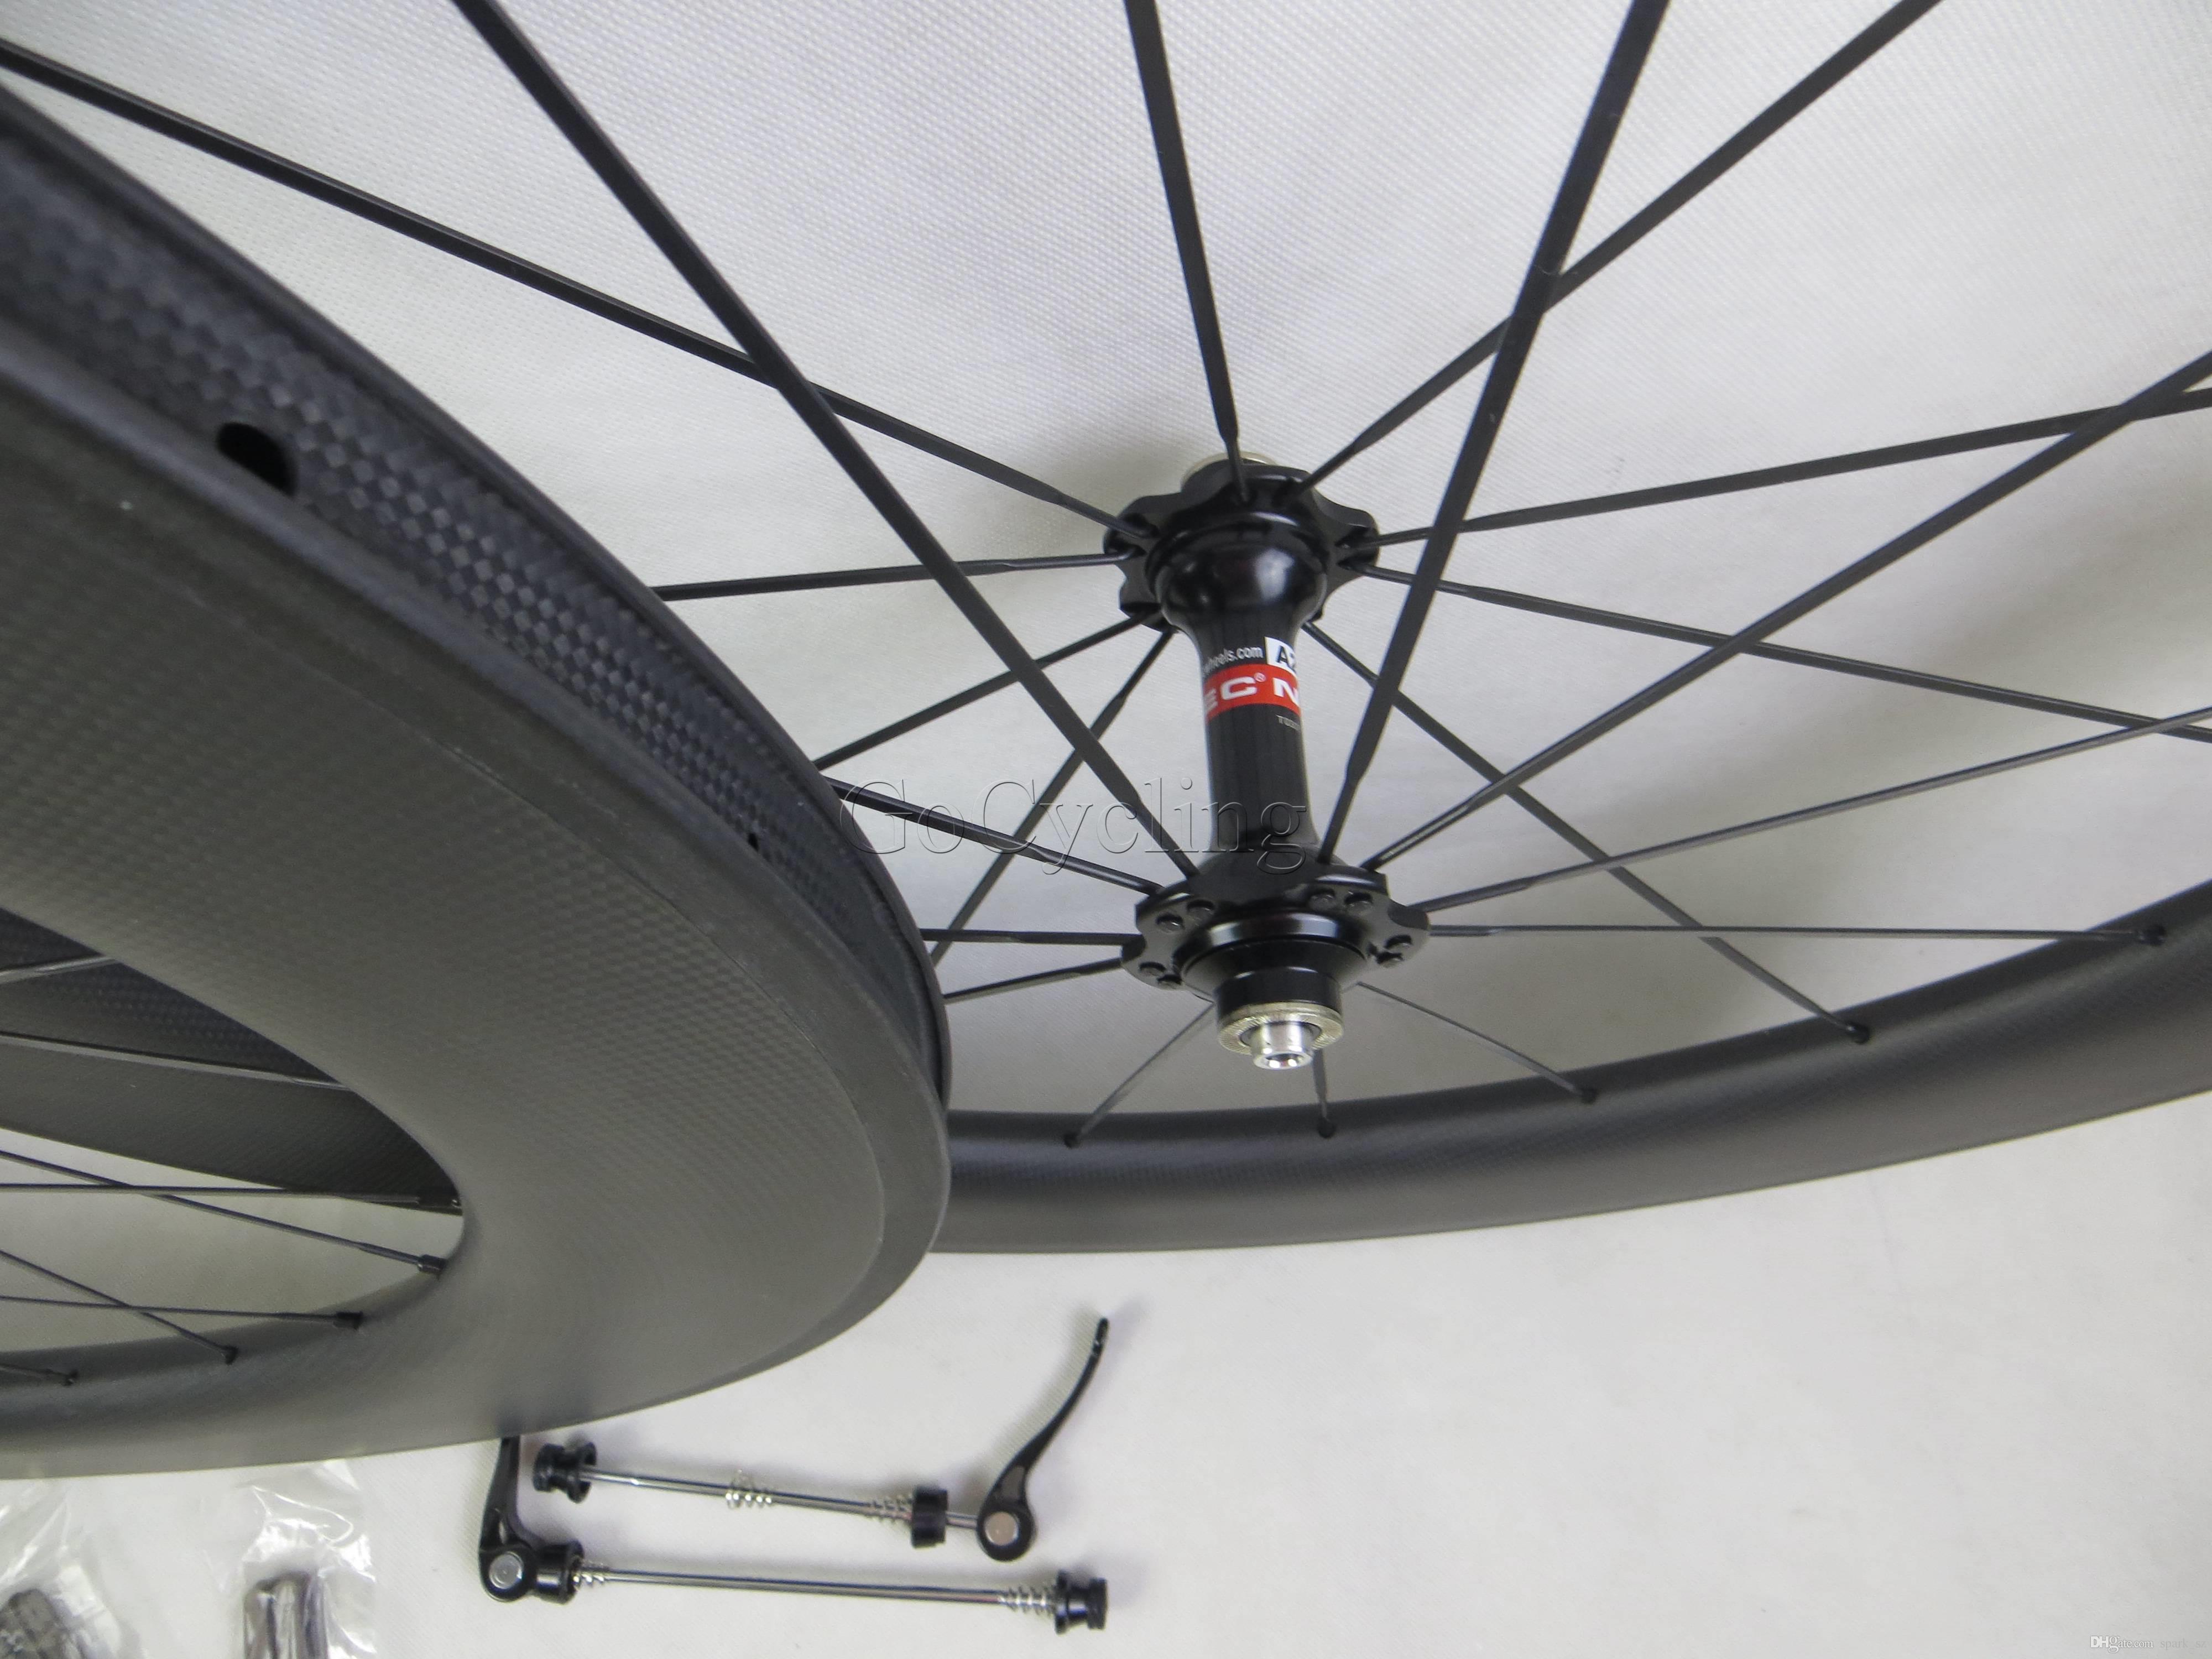 Carbon bicycle wheels 90mm 3K basalt brake surface clincher tubular road cycling bike wheelset with novatec hub width 25mm